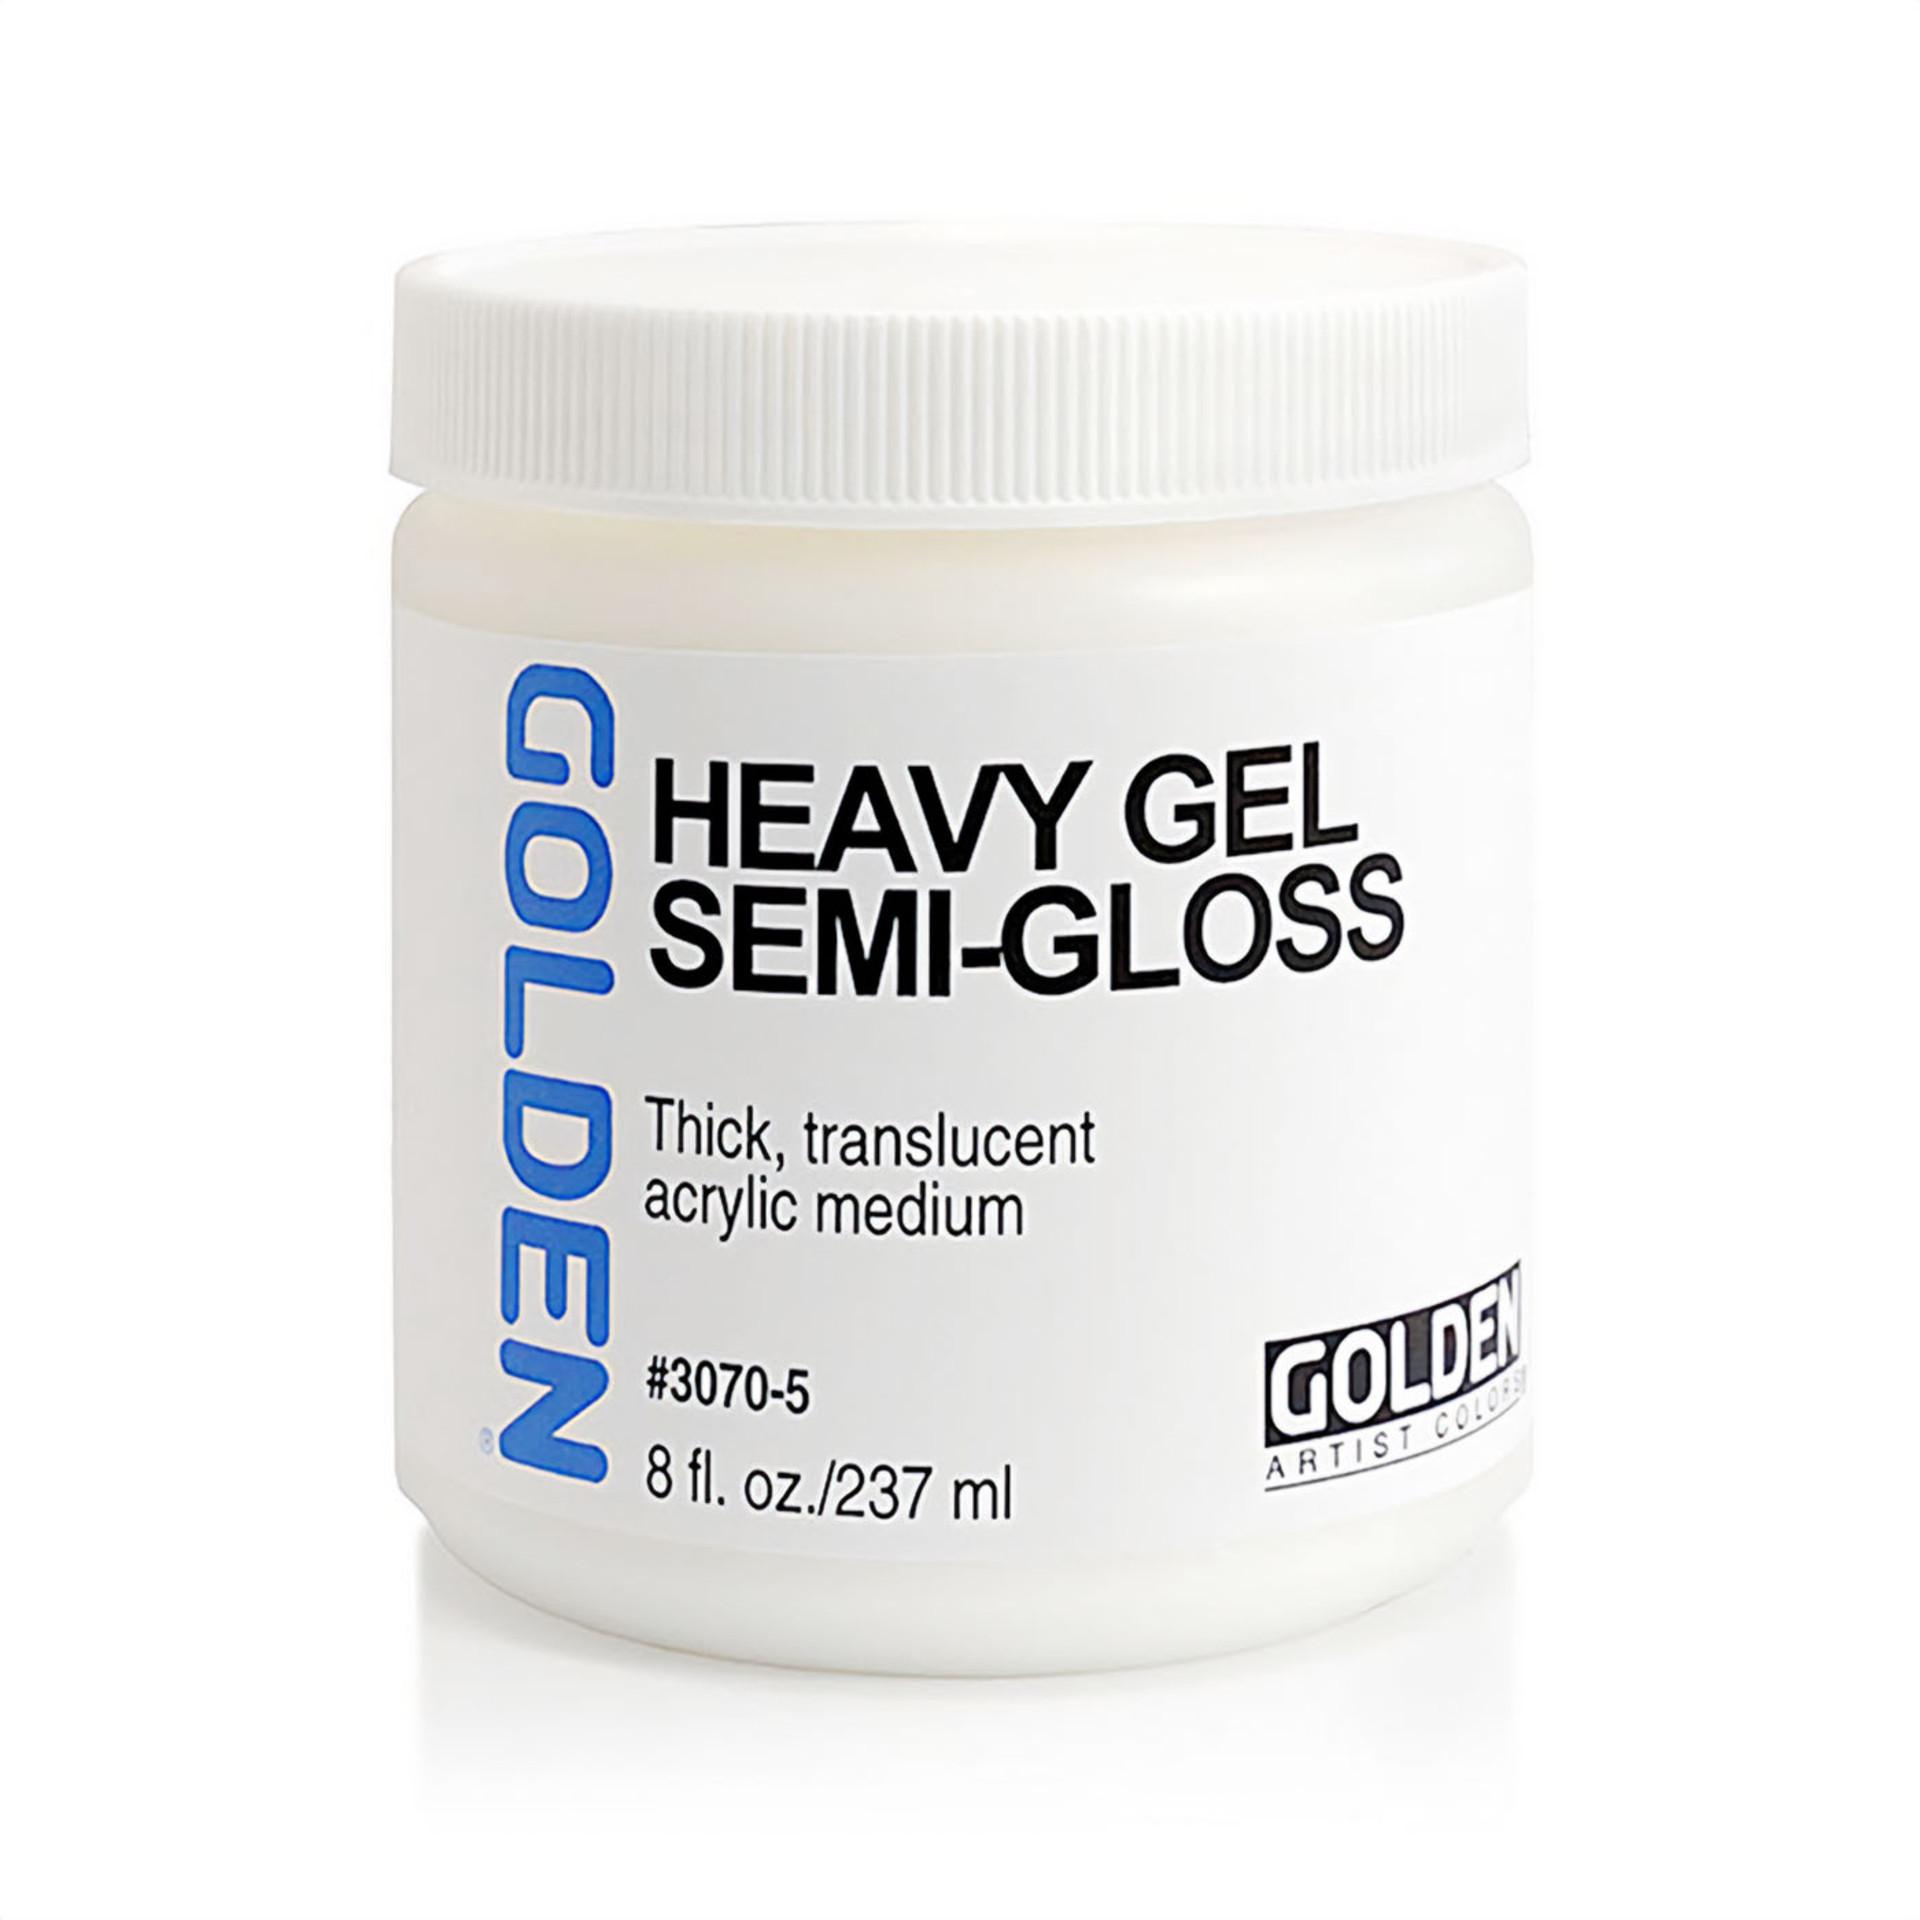 Golden Artist 8oz Heavy Gel Semi-Gloss